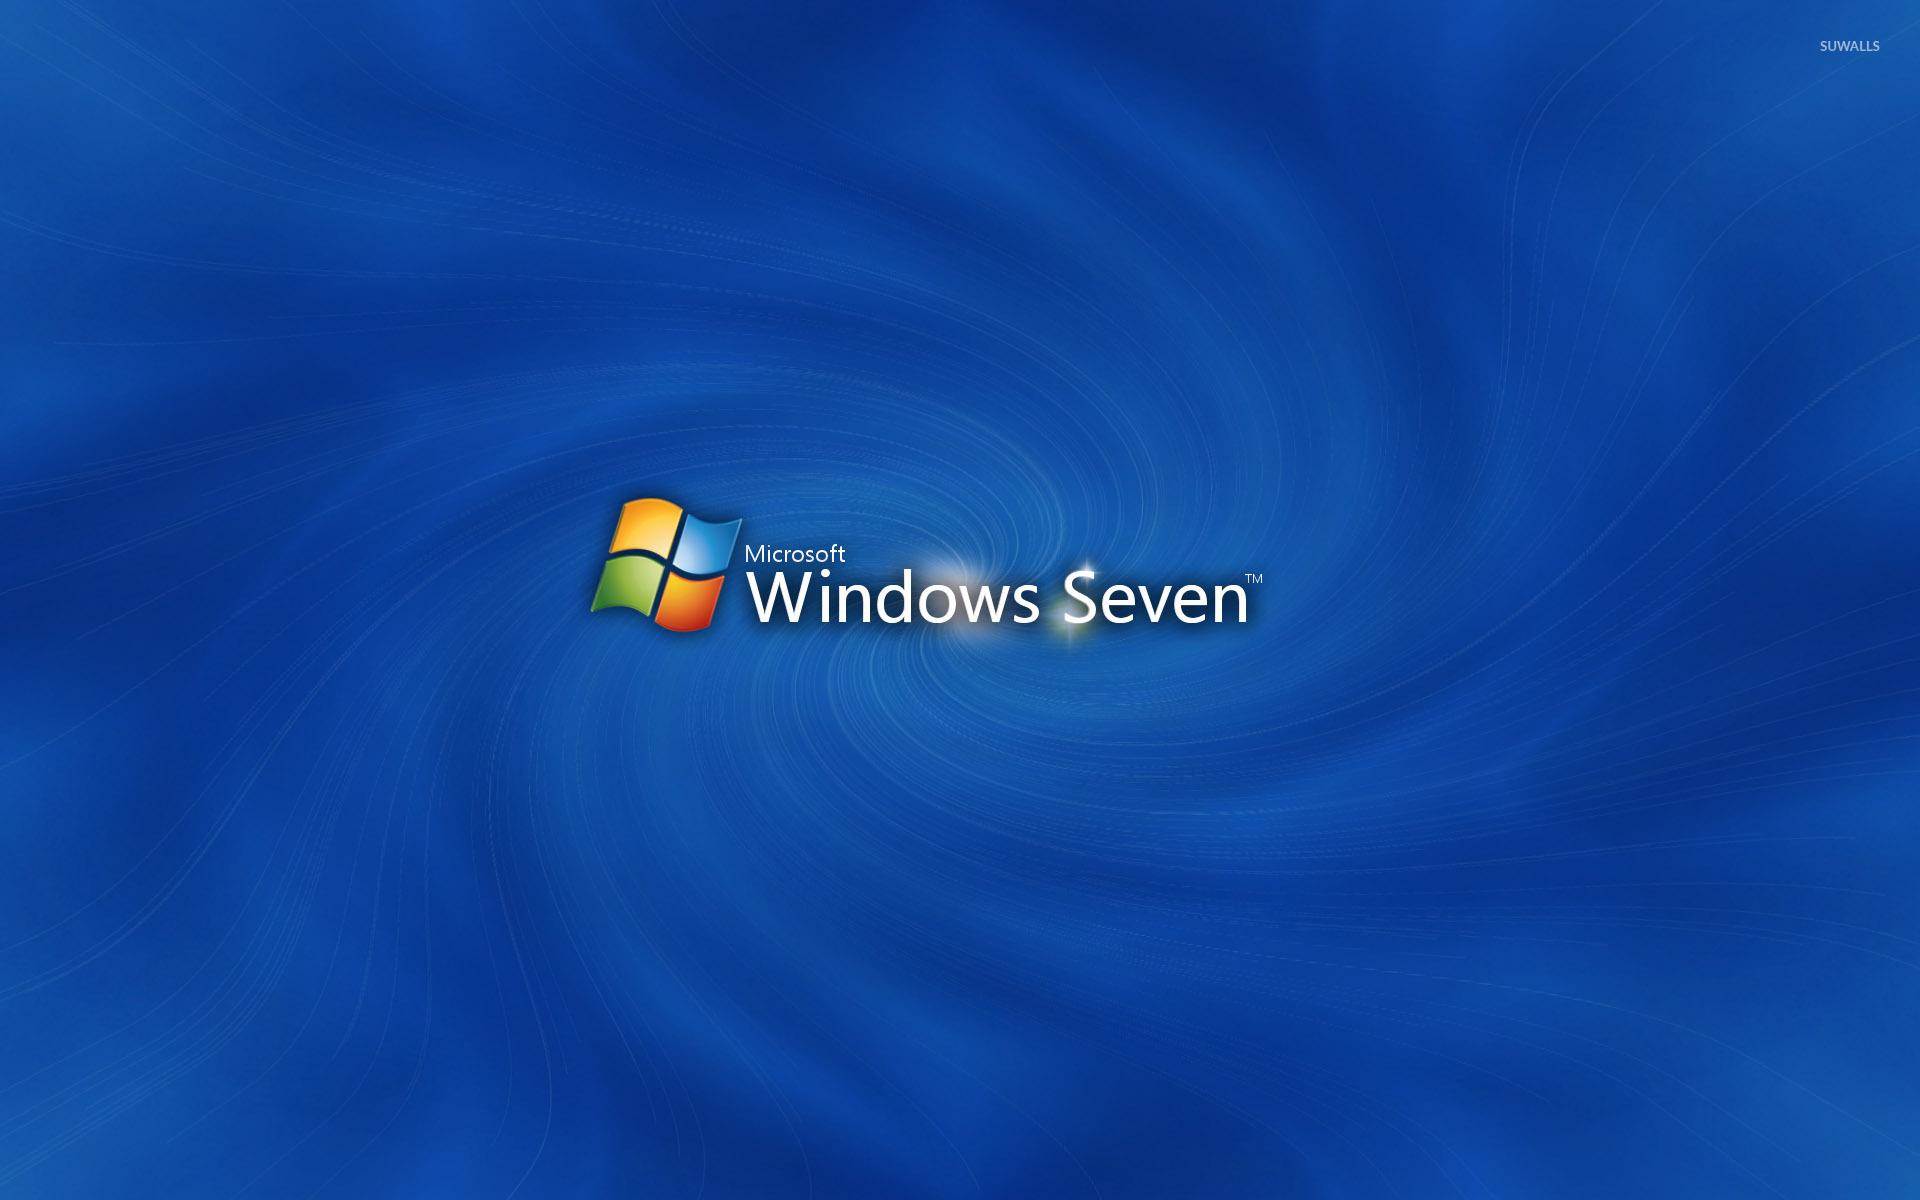 Windows 7 84 Wallpaper Computer Wallpapers 34722